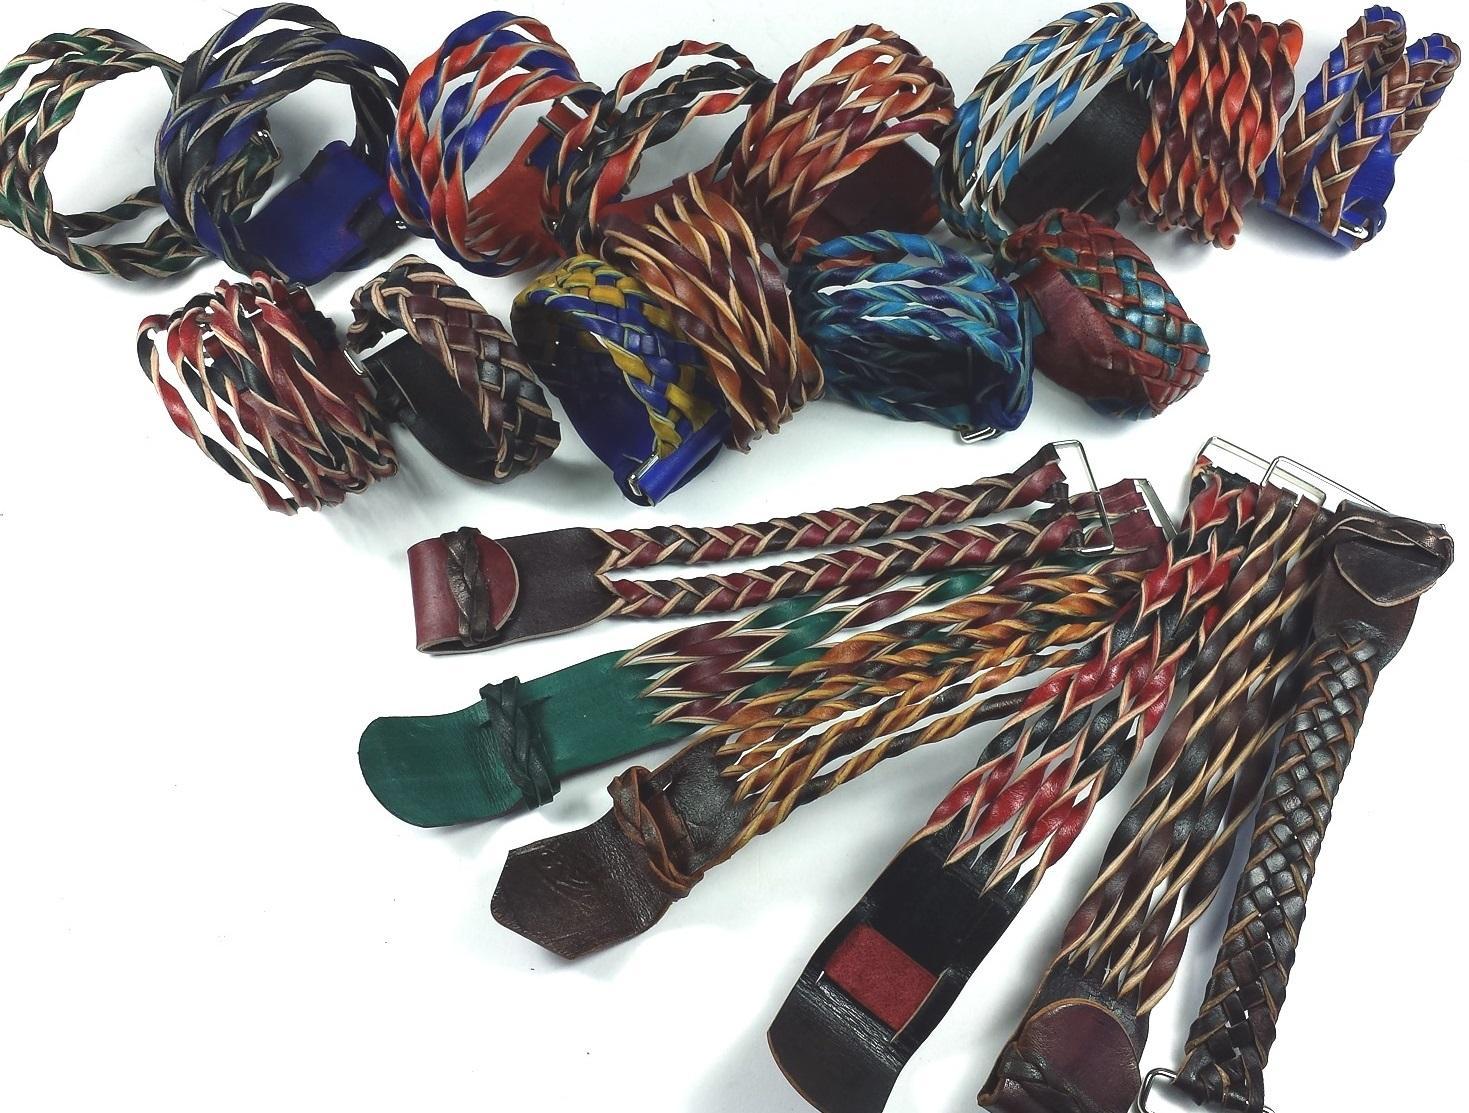 Making Leather Twisted Bracelets